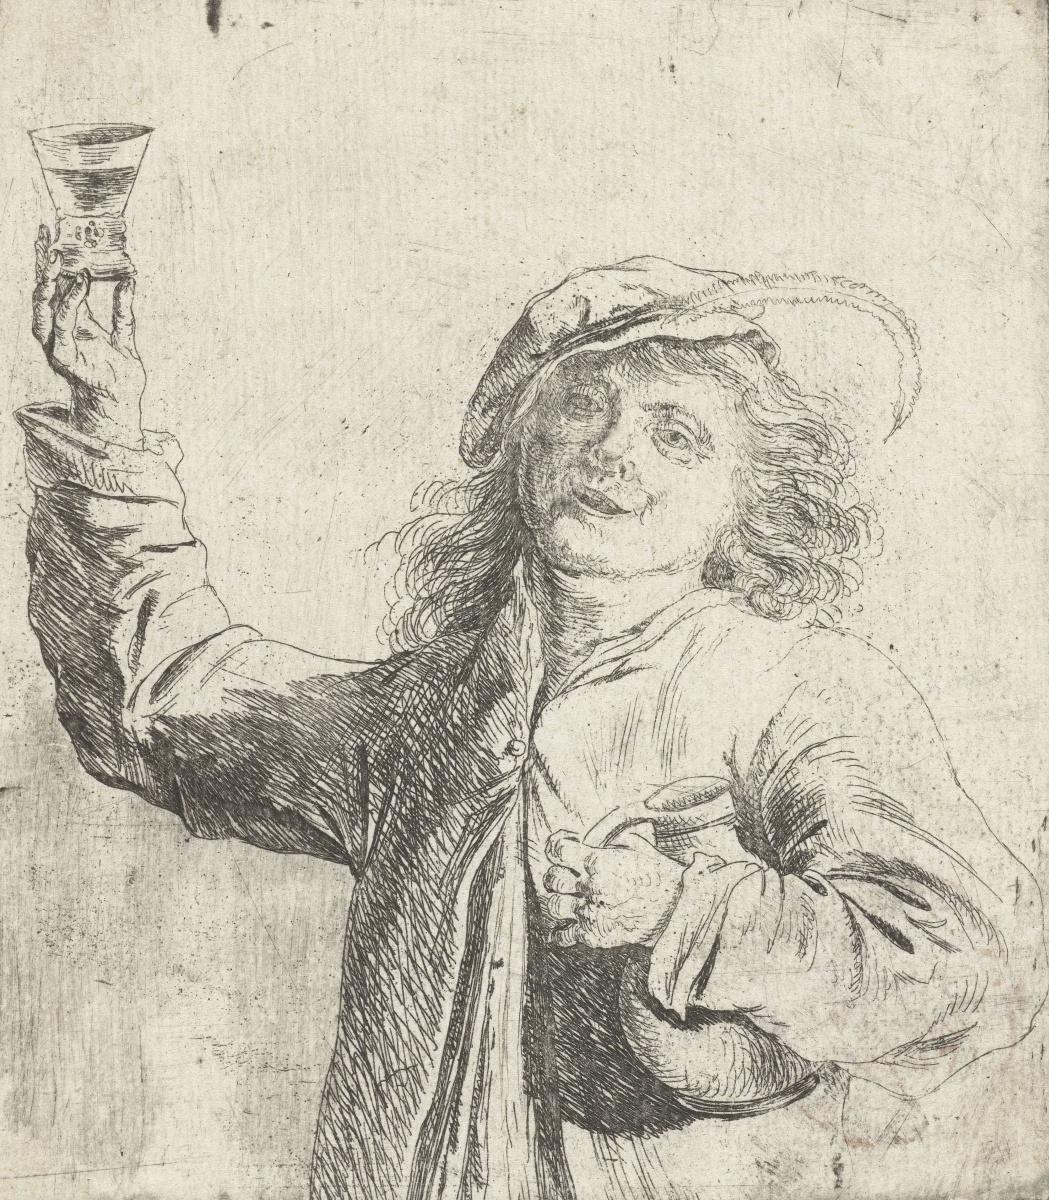 Ян Ливенс. Мужчина со стаканом в руке и кувшином под мышкой